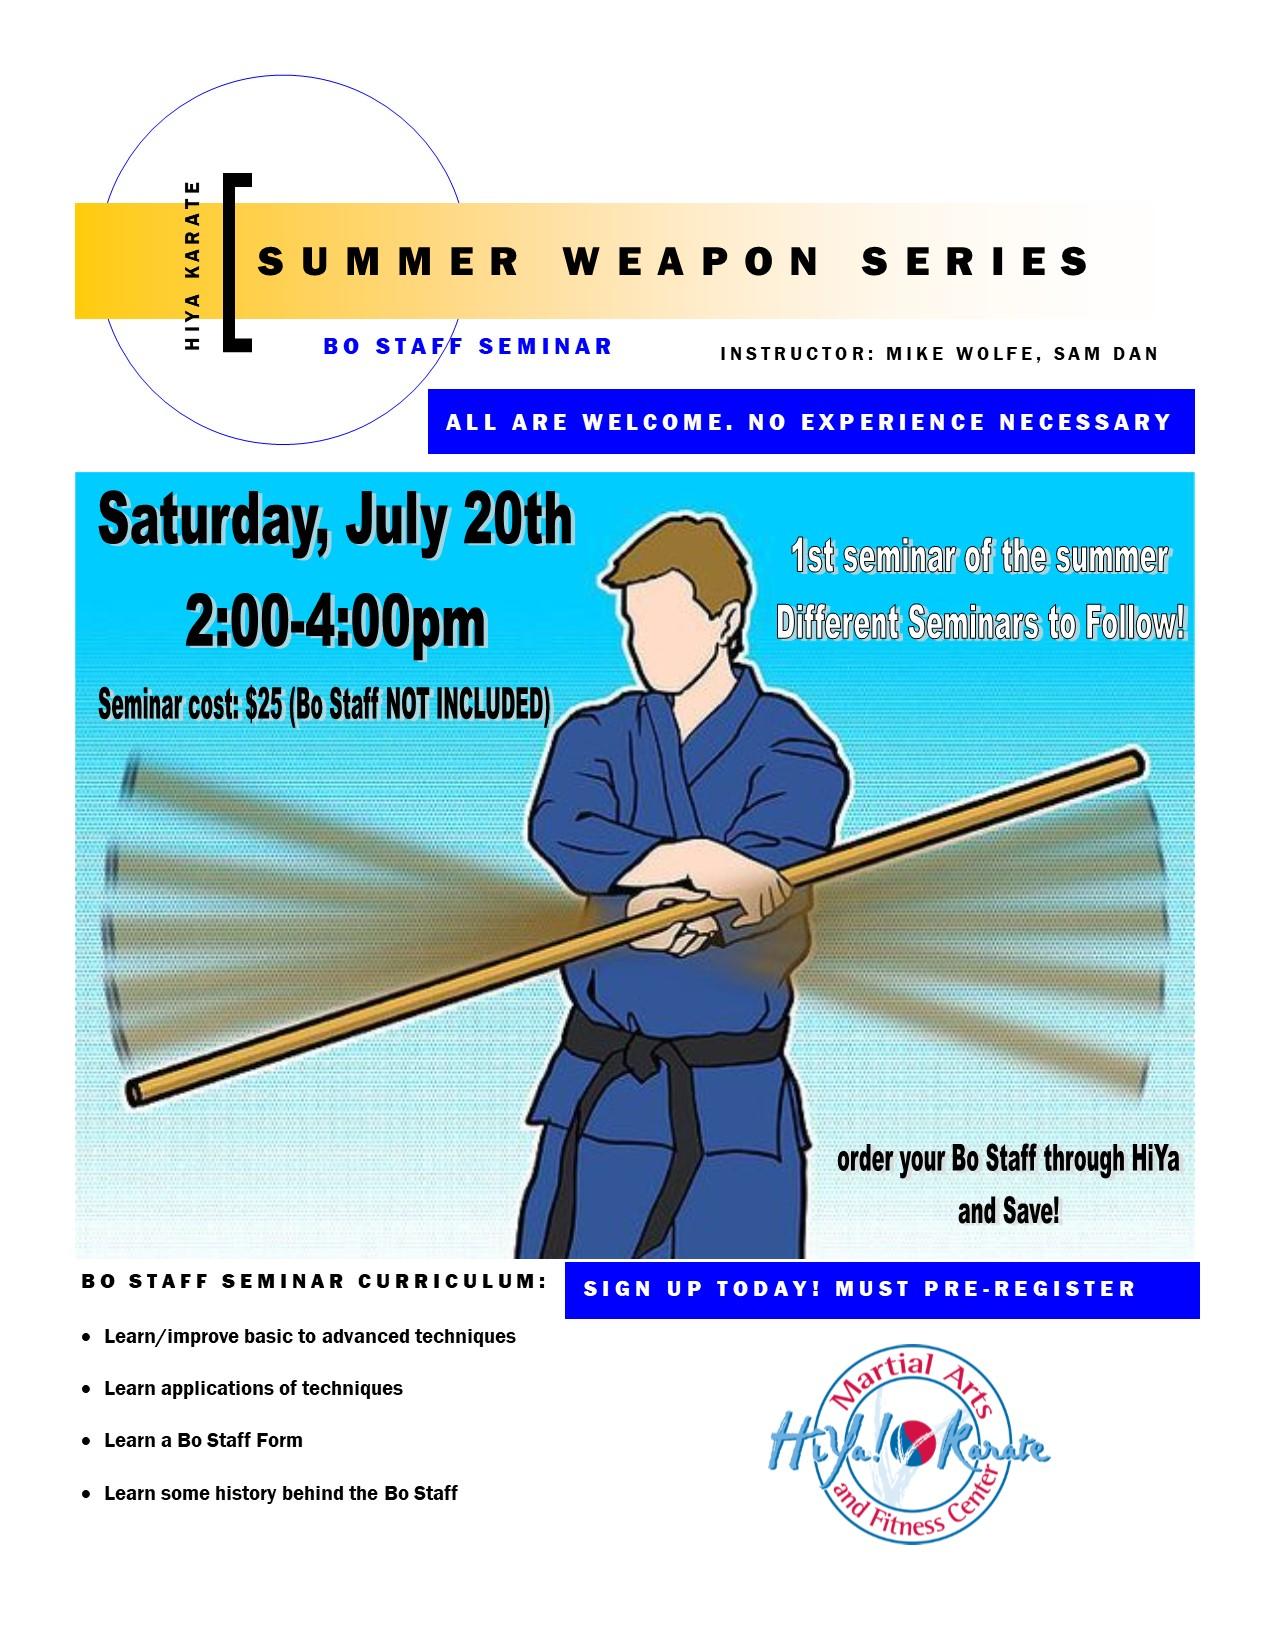 weapon seminar Bo Staff.jpg